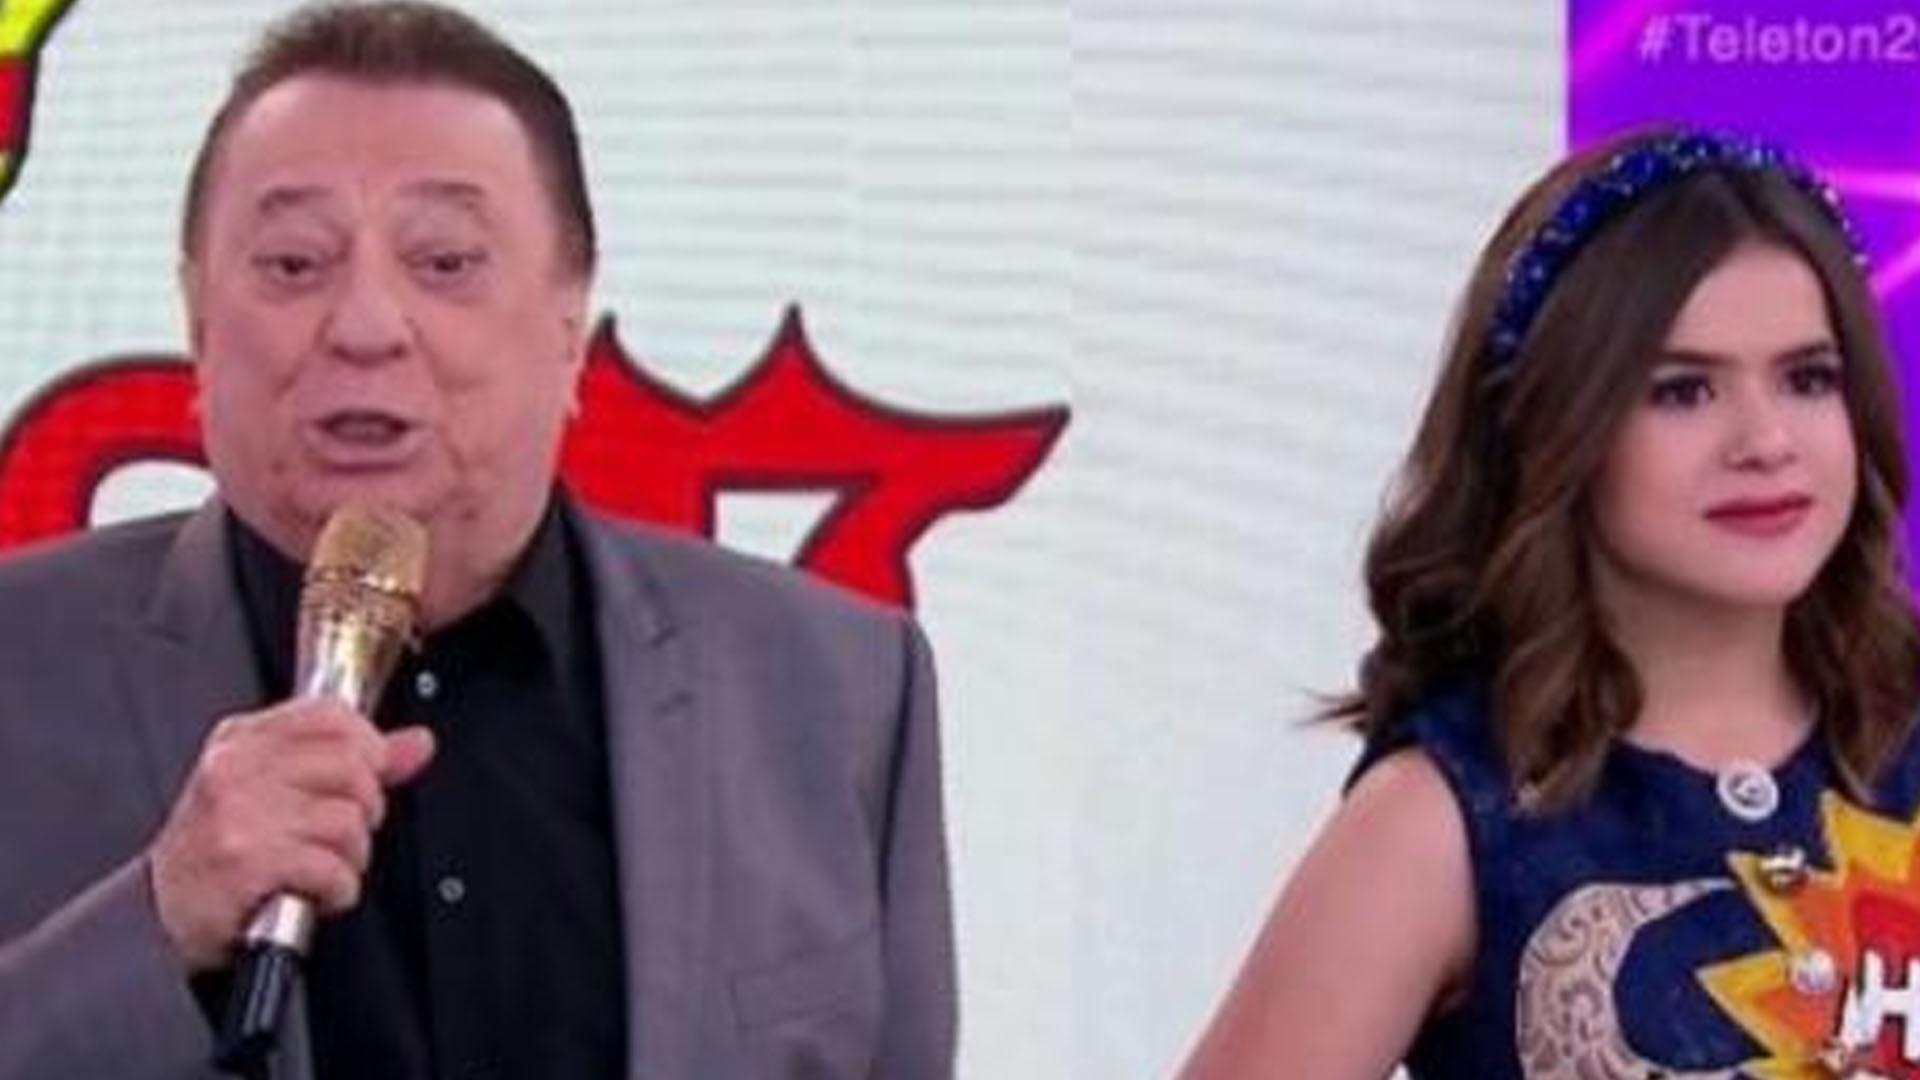 Raul Gil exalta Jair Bolsonaro no Teleton e leva cortada de Maisa